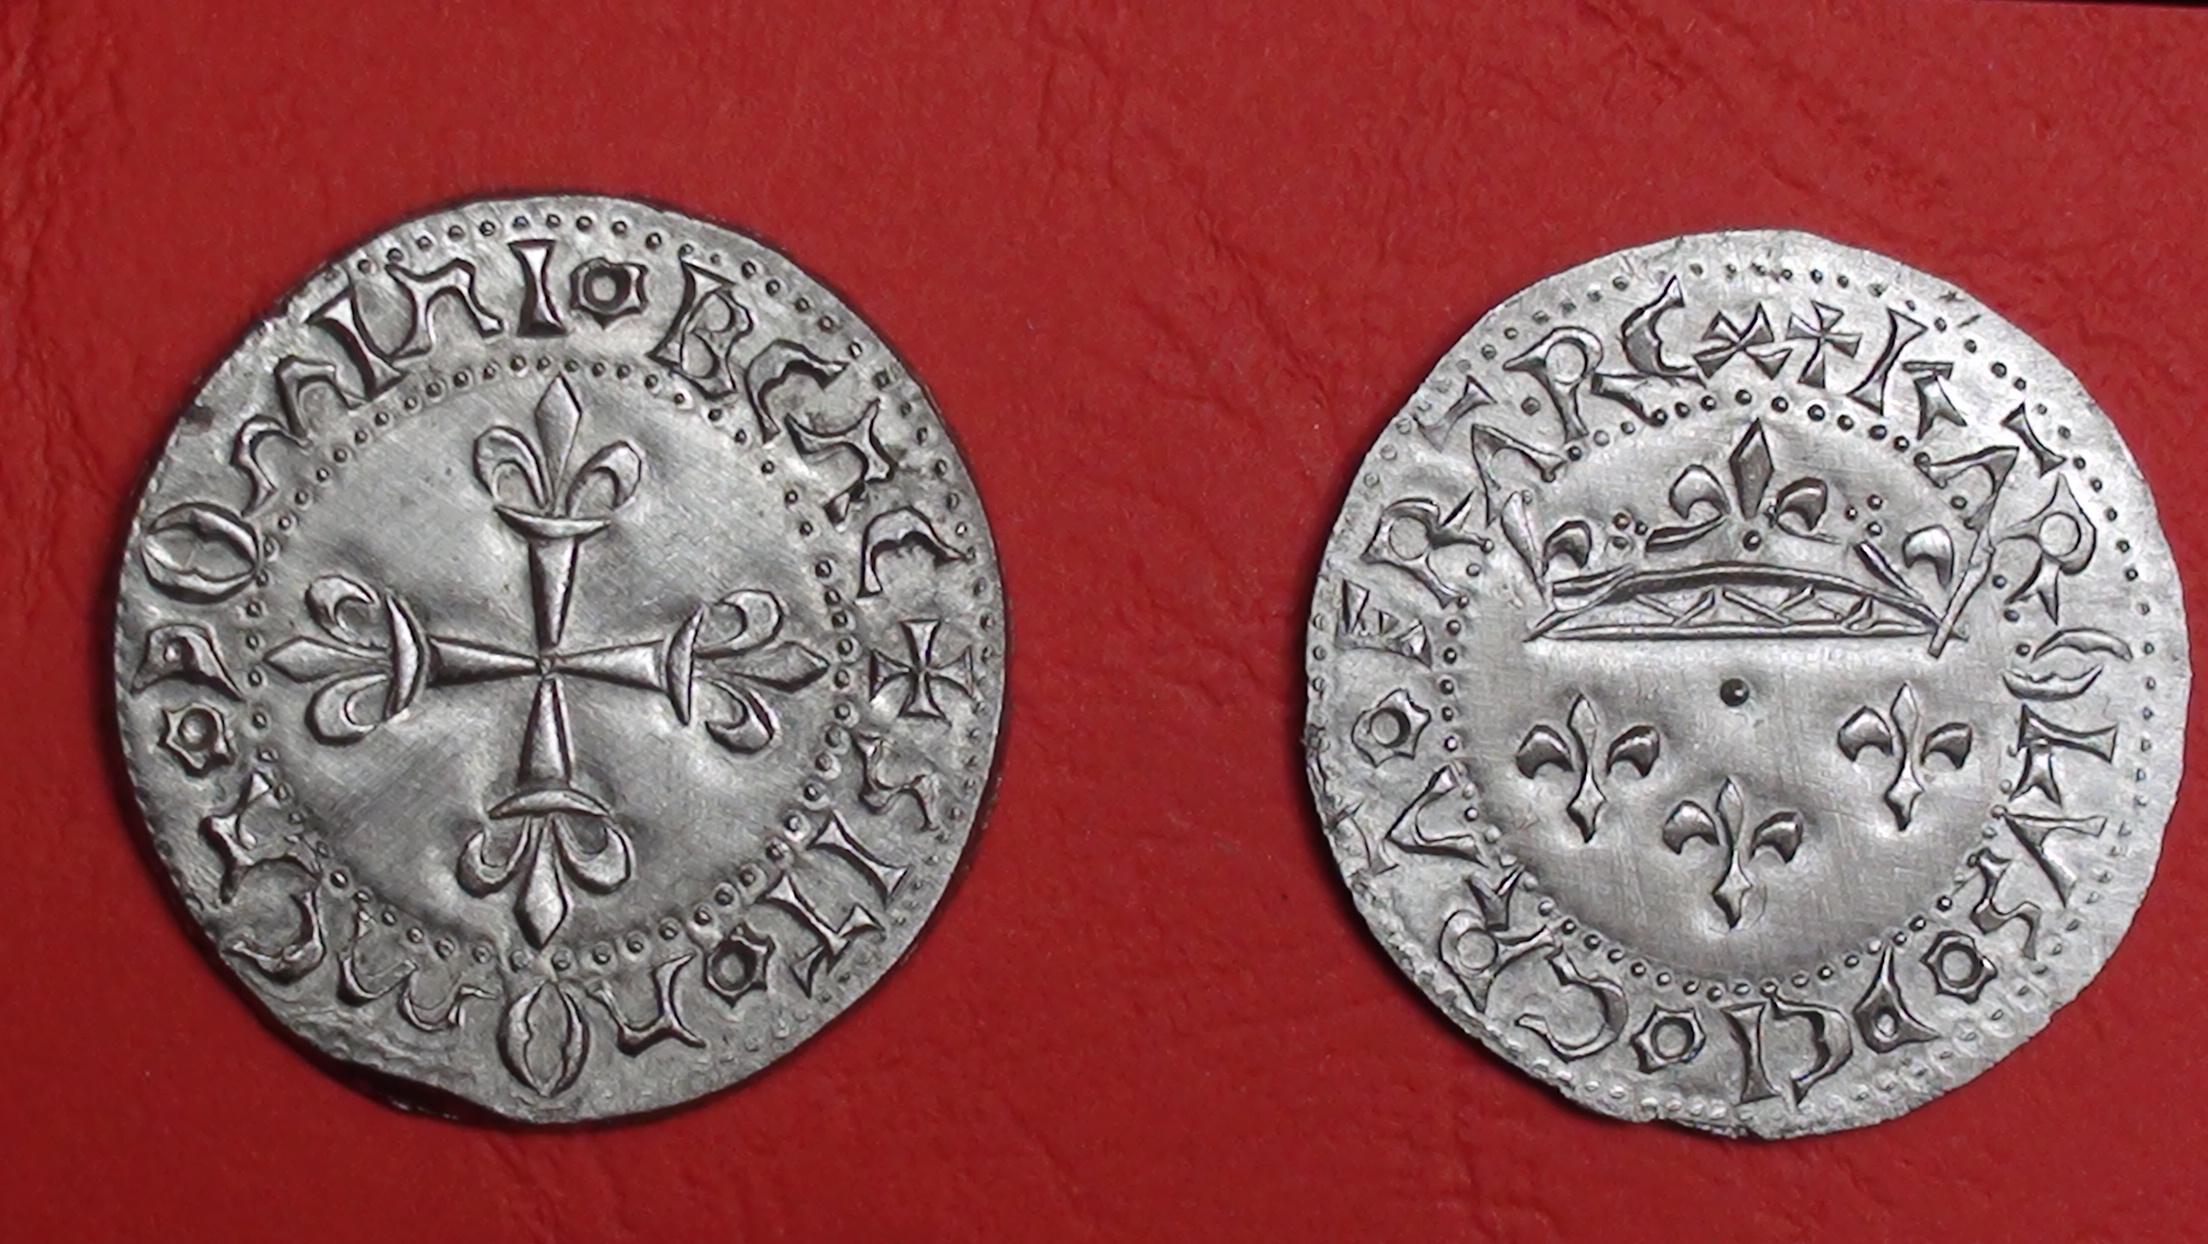 Charles VII - Gros de roi